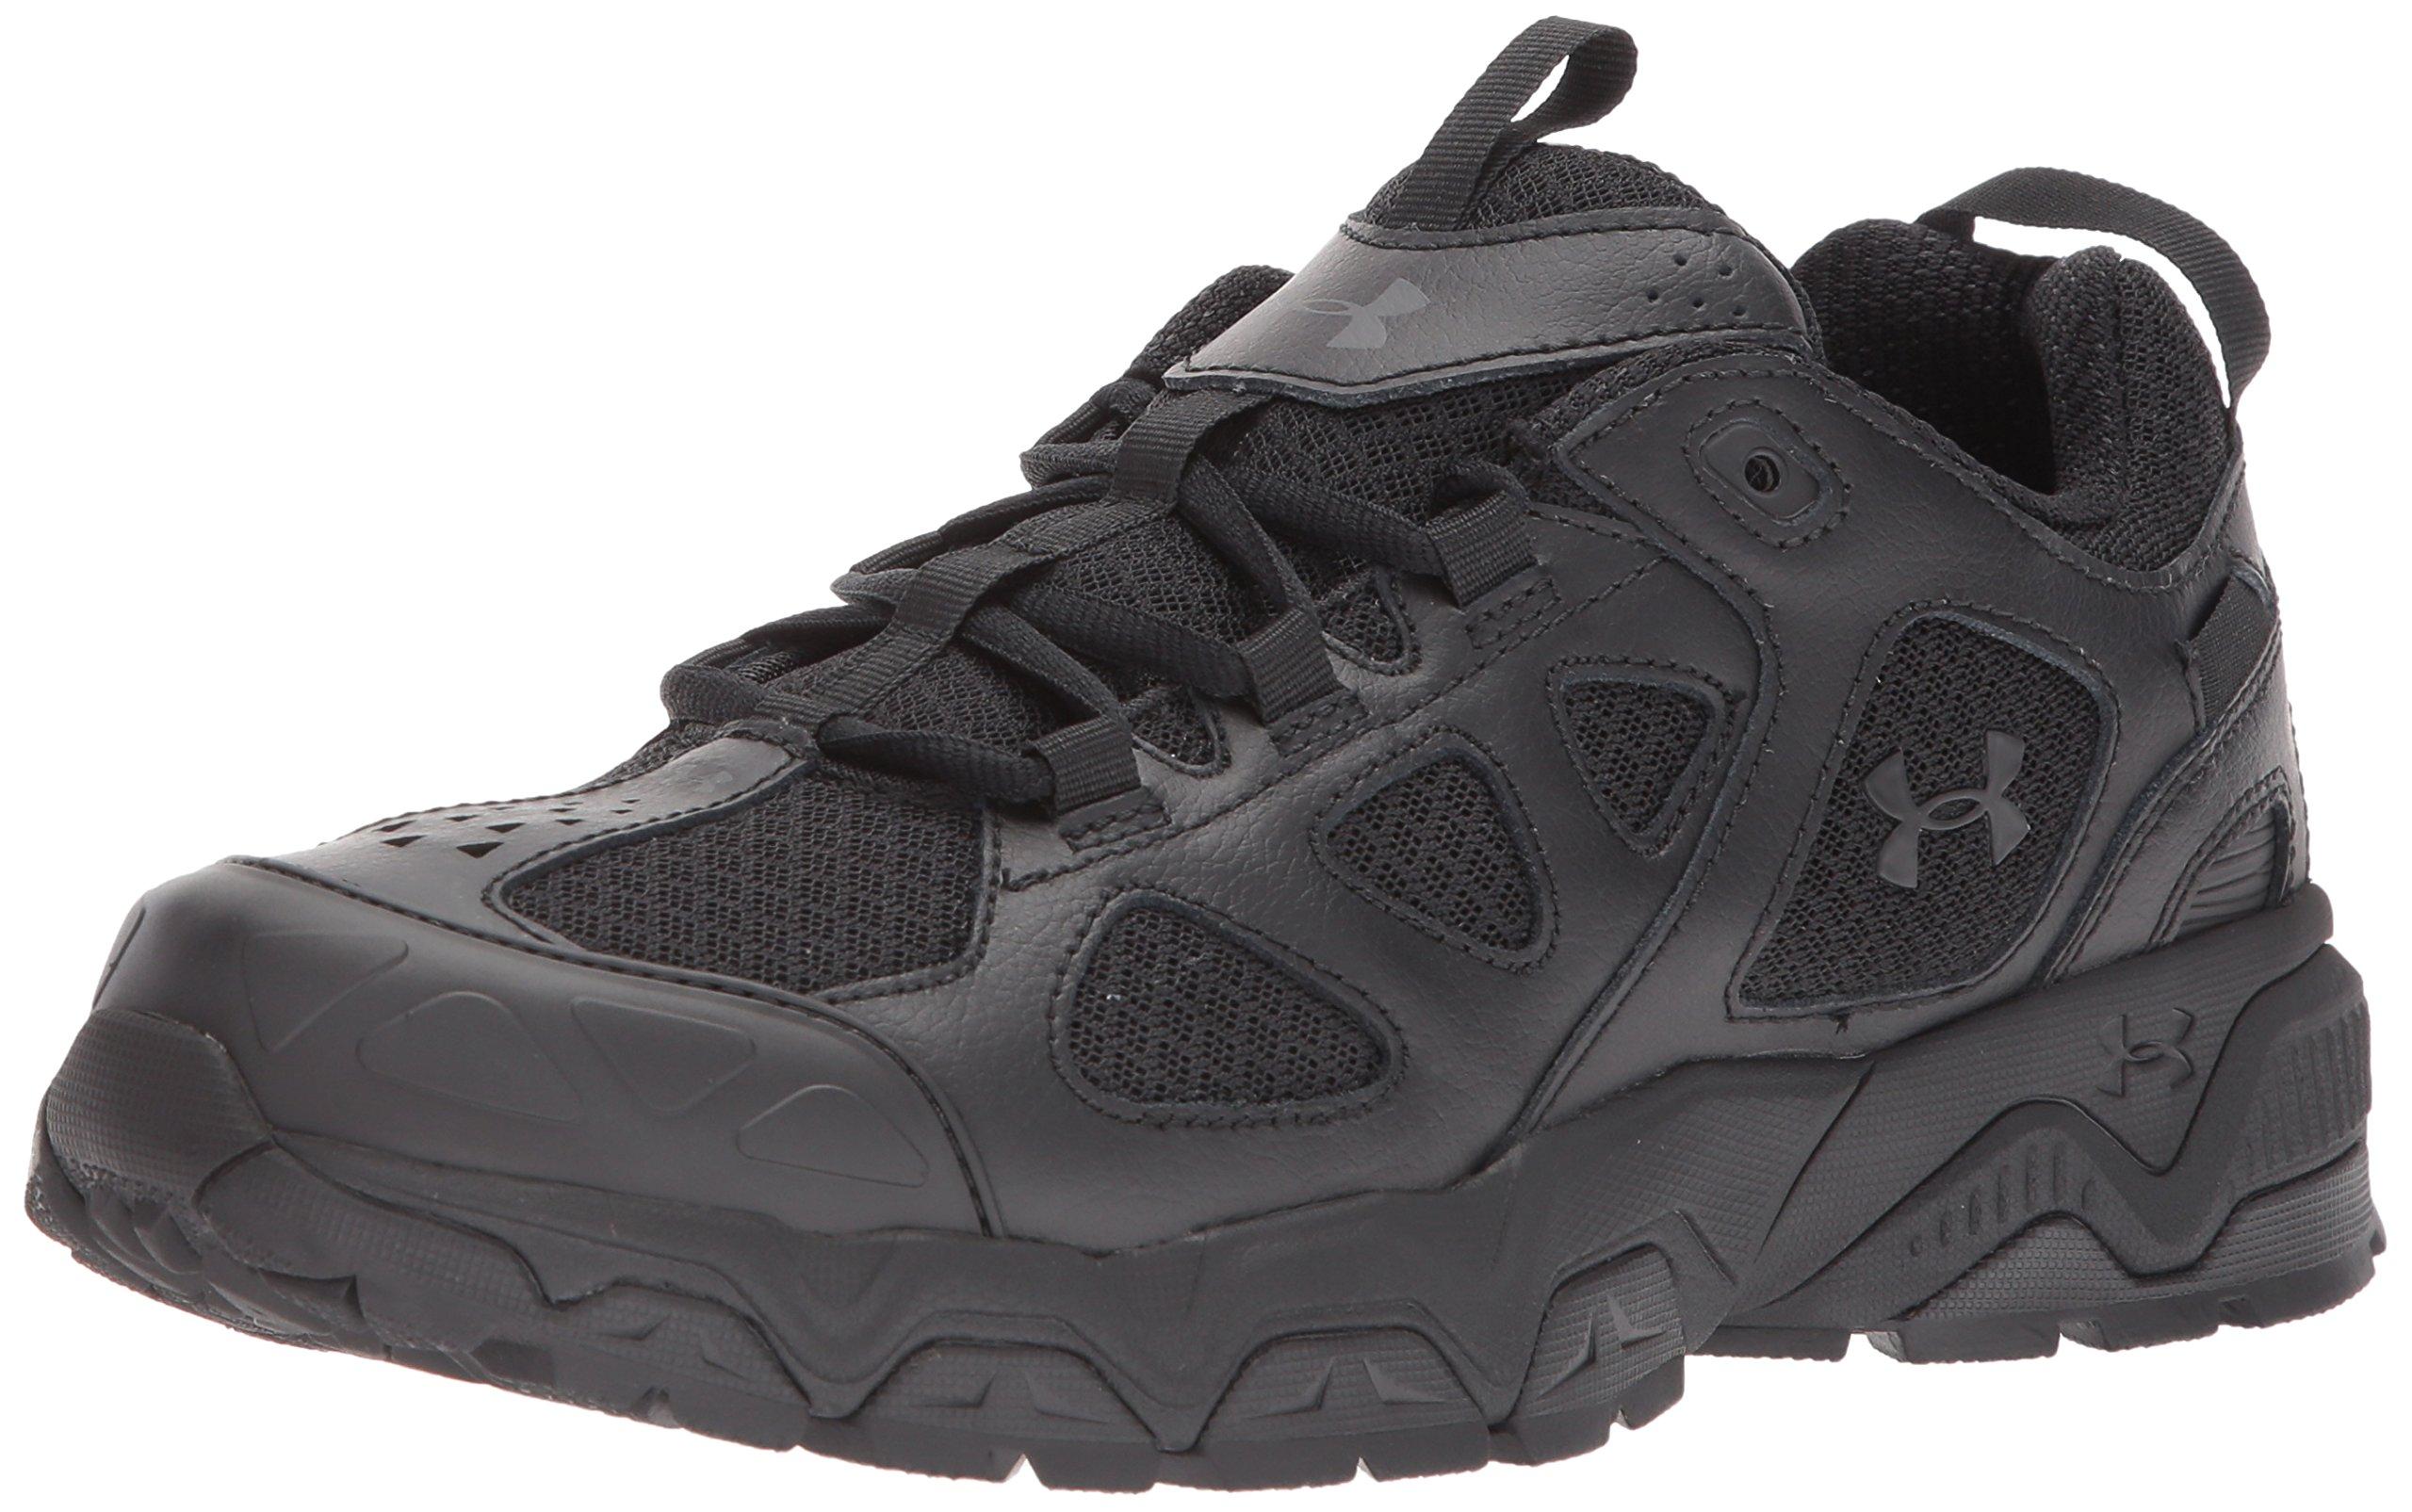 Under Armour Men's Mirage 3.0 Hiking Shoe, Black (001)/Black, 10.5